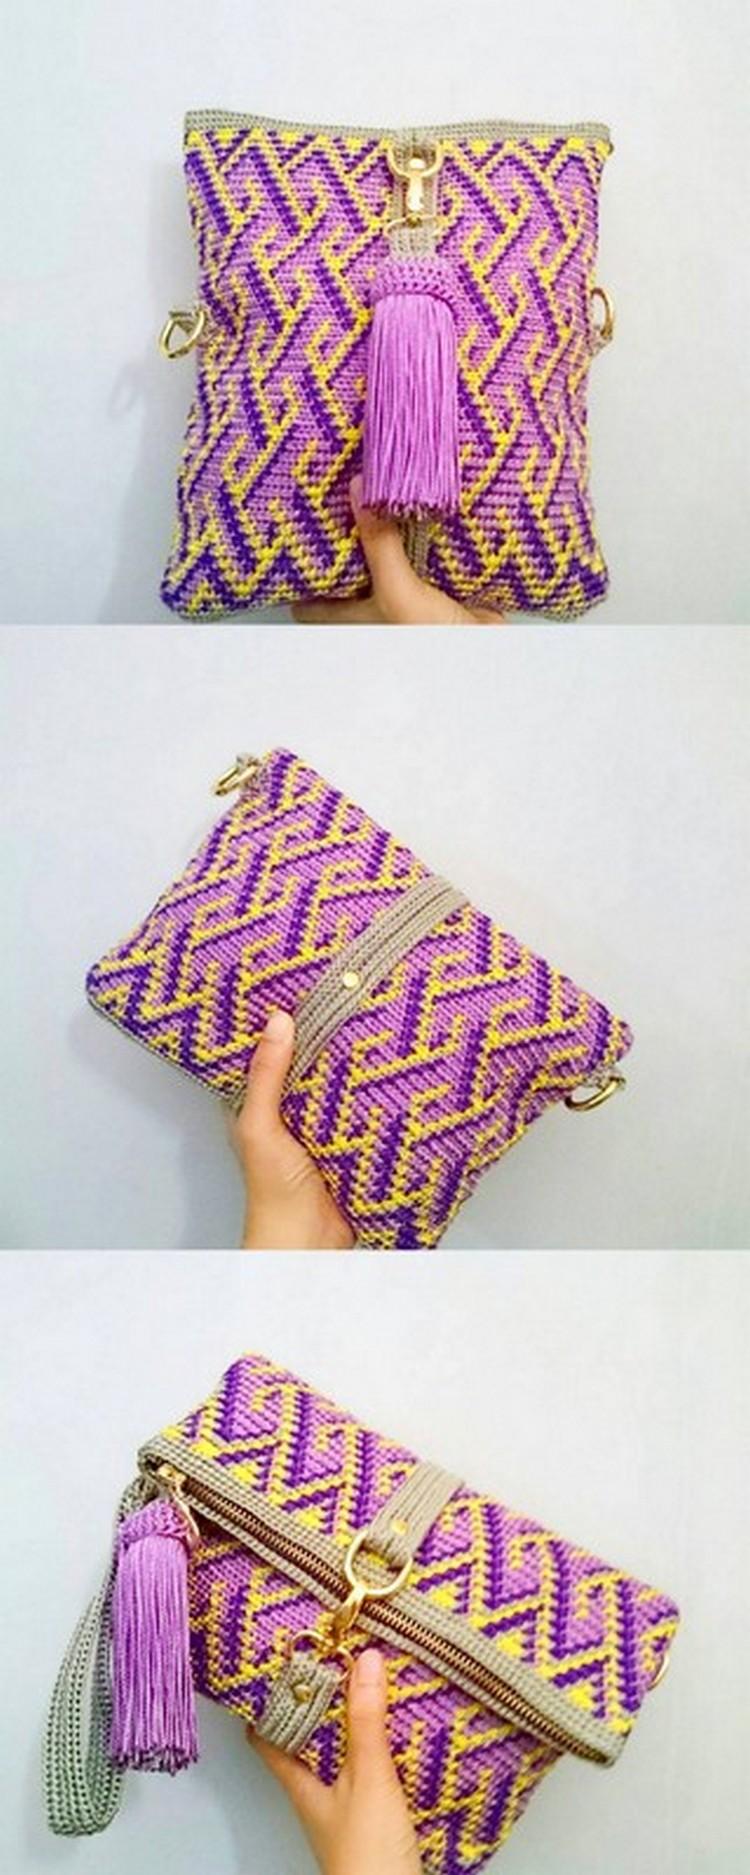 Pom Style Bag Free Crochet pattern